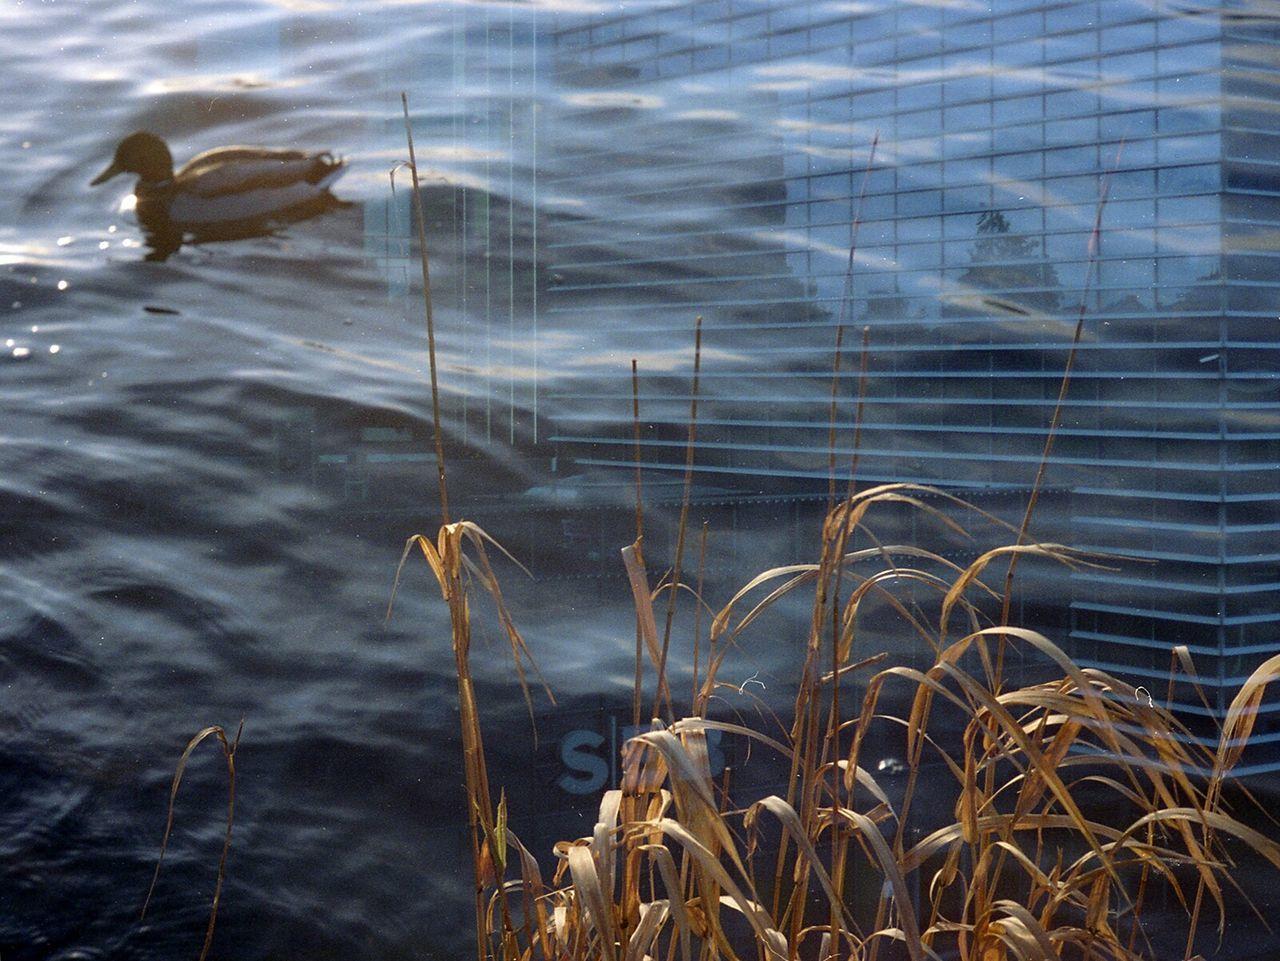 Film Swap: Bankers Dream About Ducks, too. Film Swap 35mm Film Multiexposure  Lithuania Norway Skycraper Duck Analogue Photography Surreal